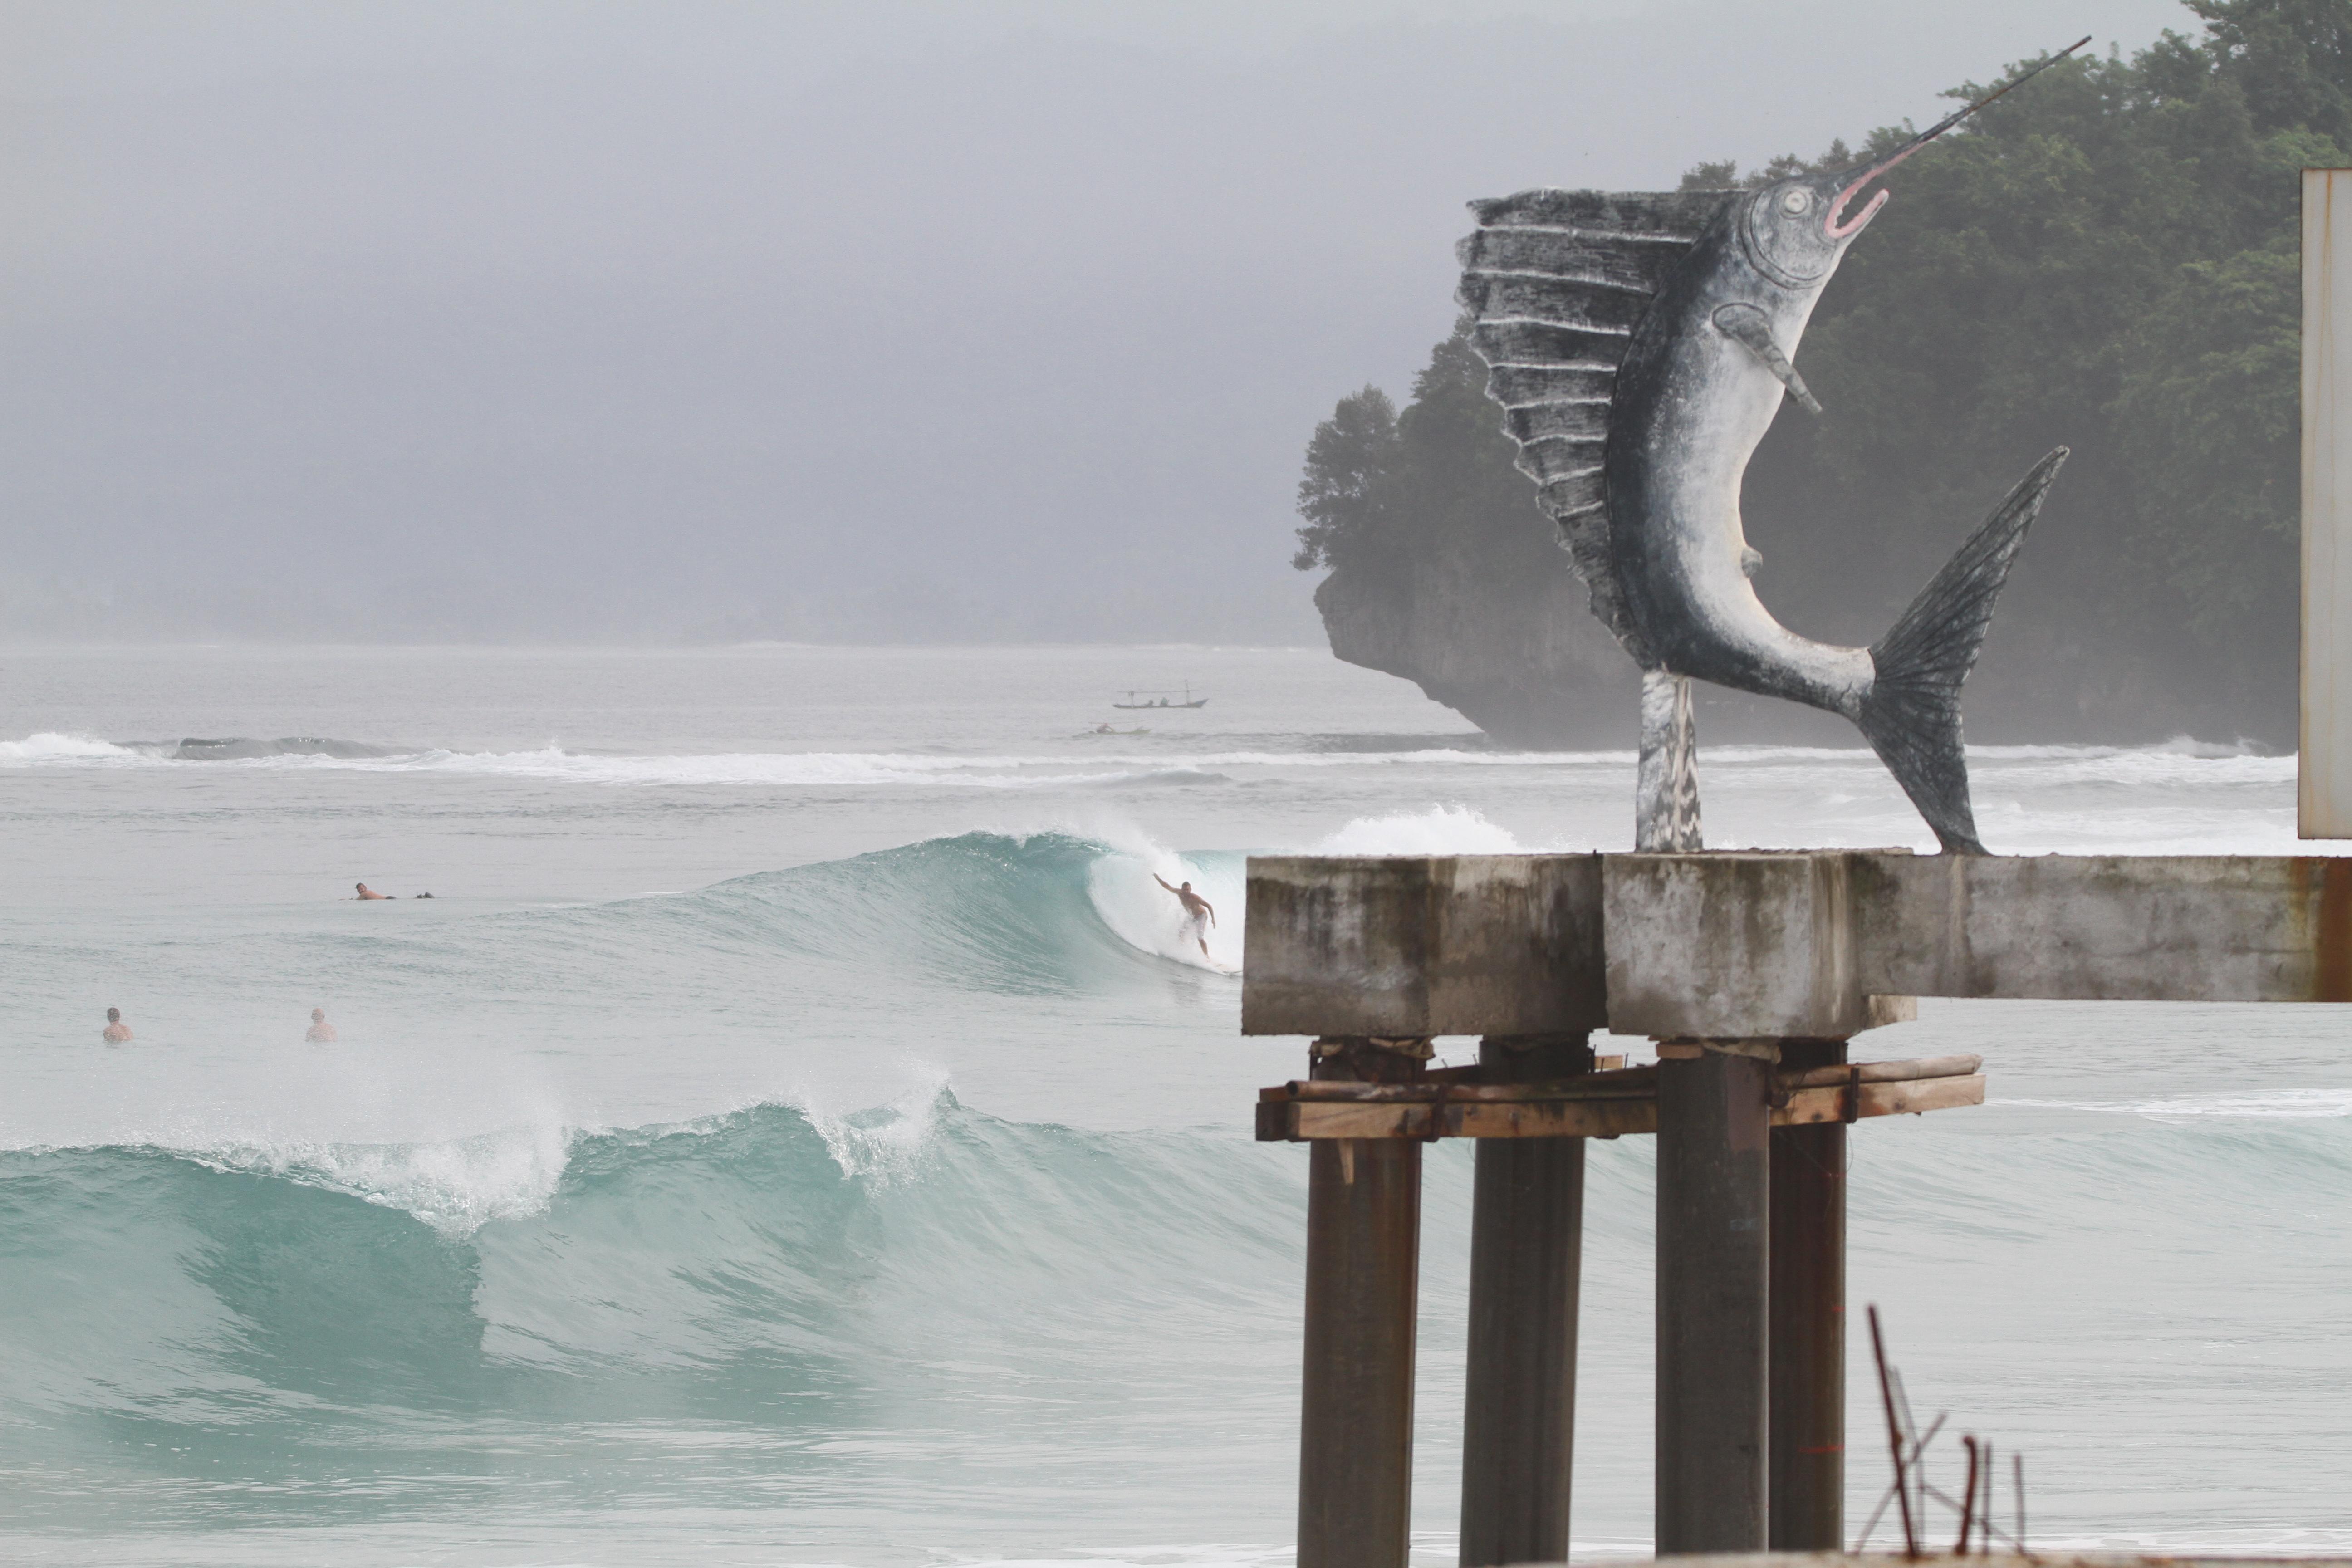 Krui Surf wave, Krui Right